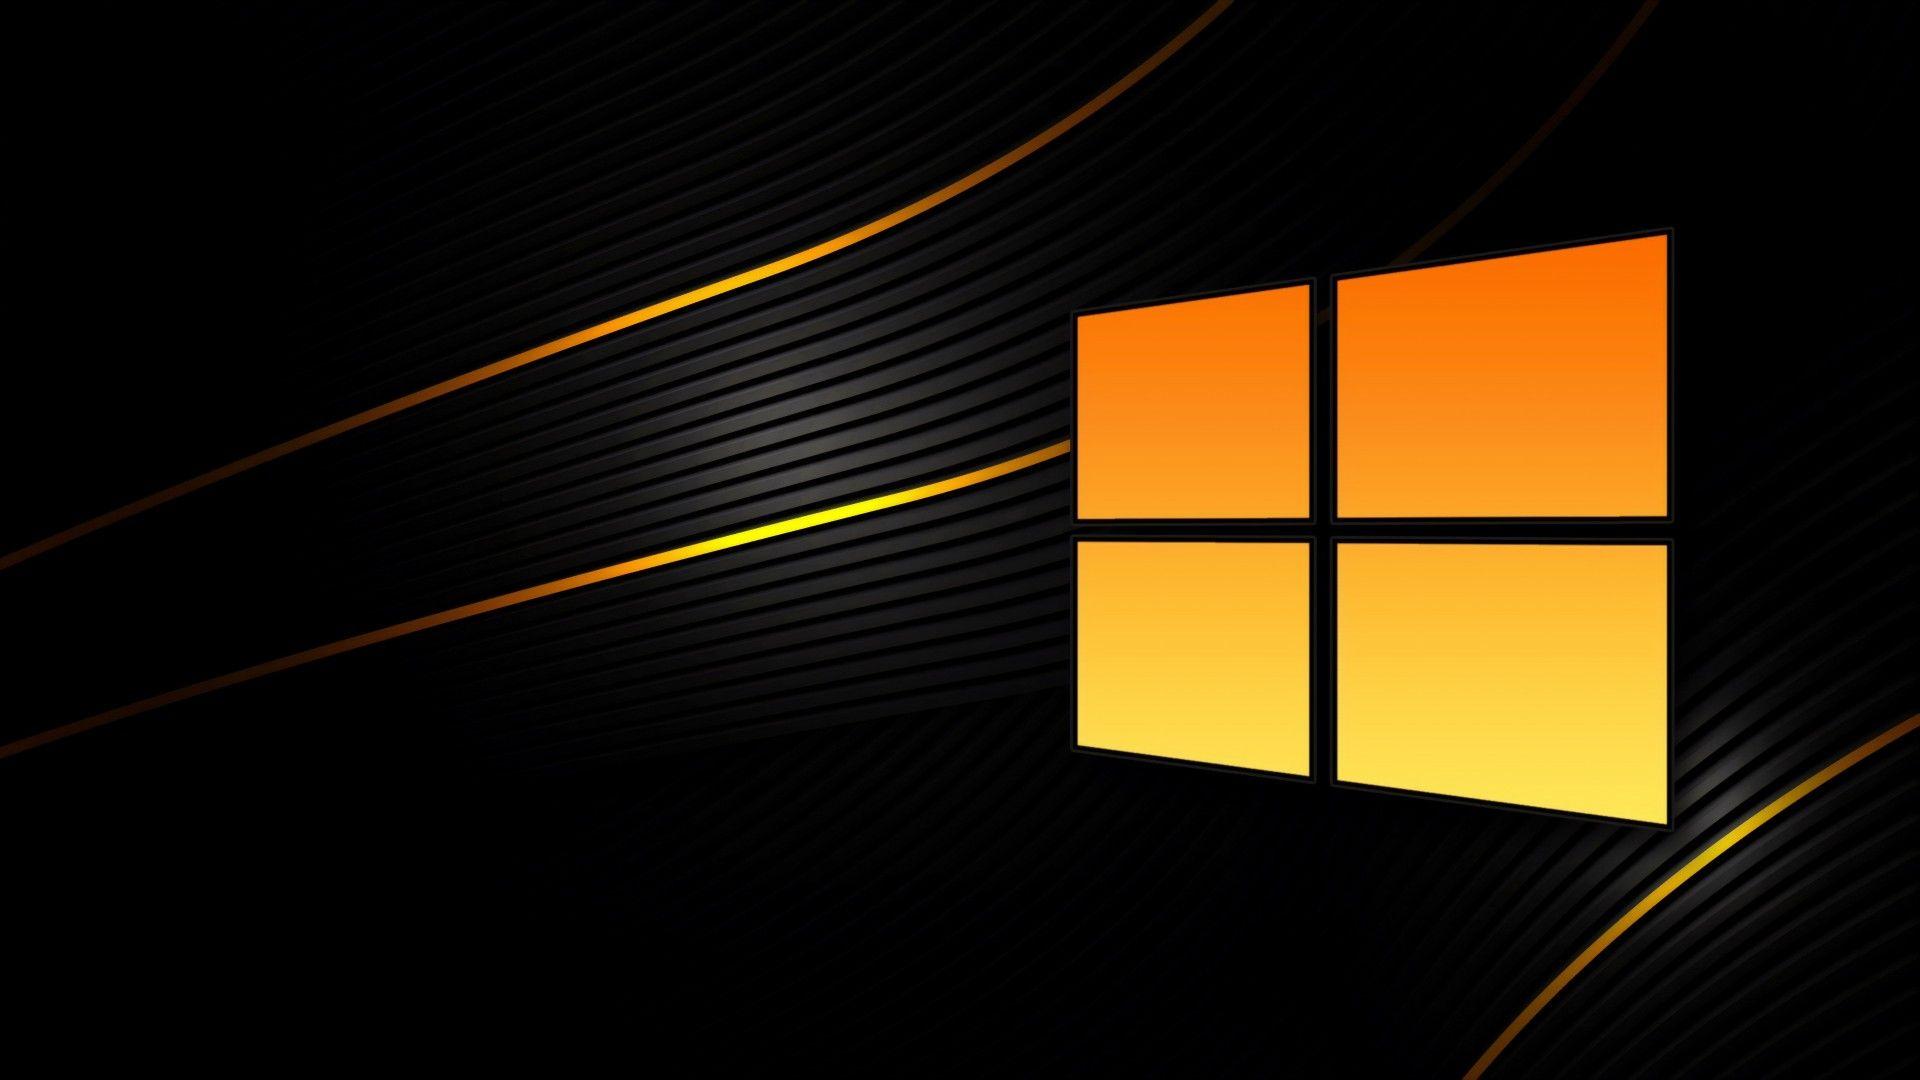 Windows 10 Black 1920x1080 Wallpaper Windows 10 Windows Wallpaper 4k Wallpapers For Pc